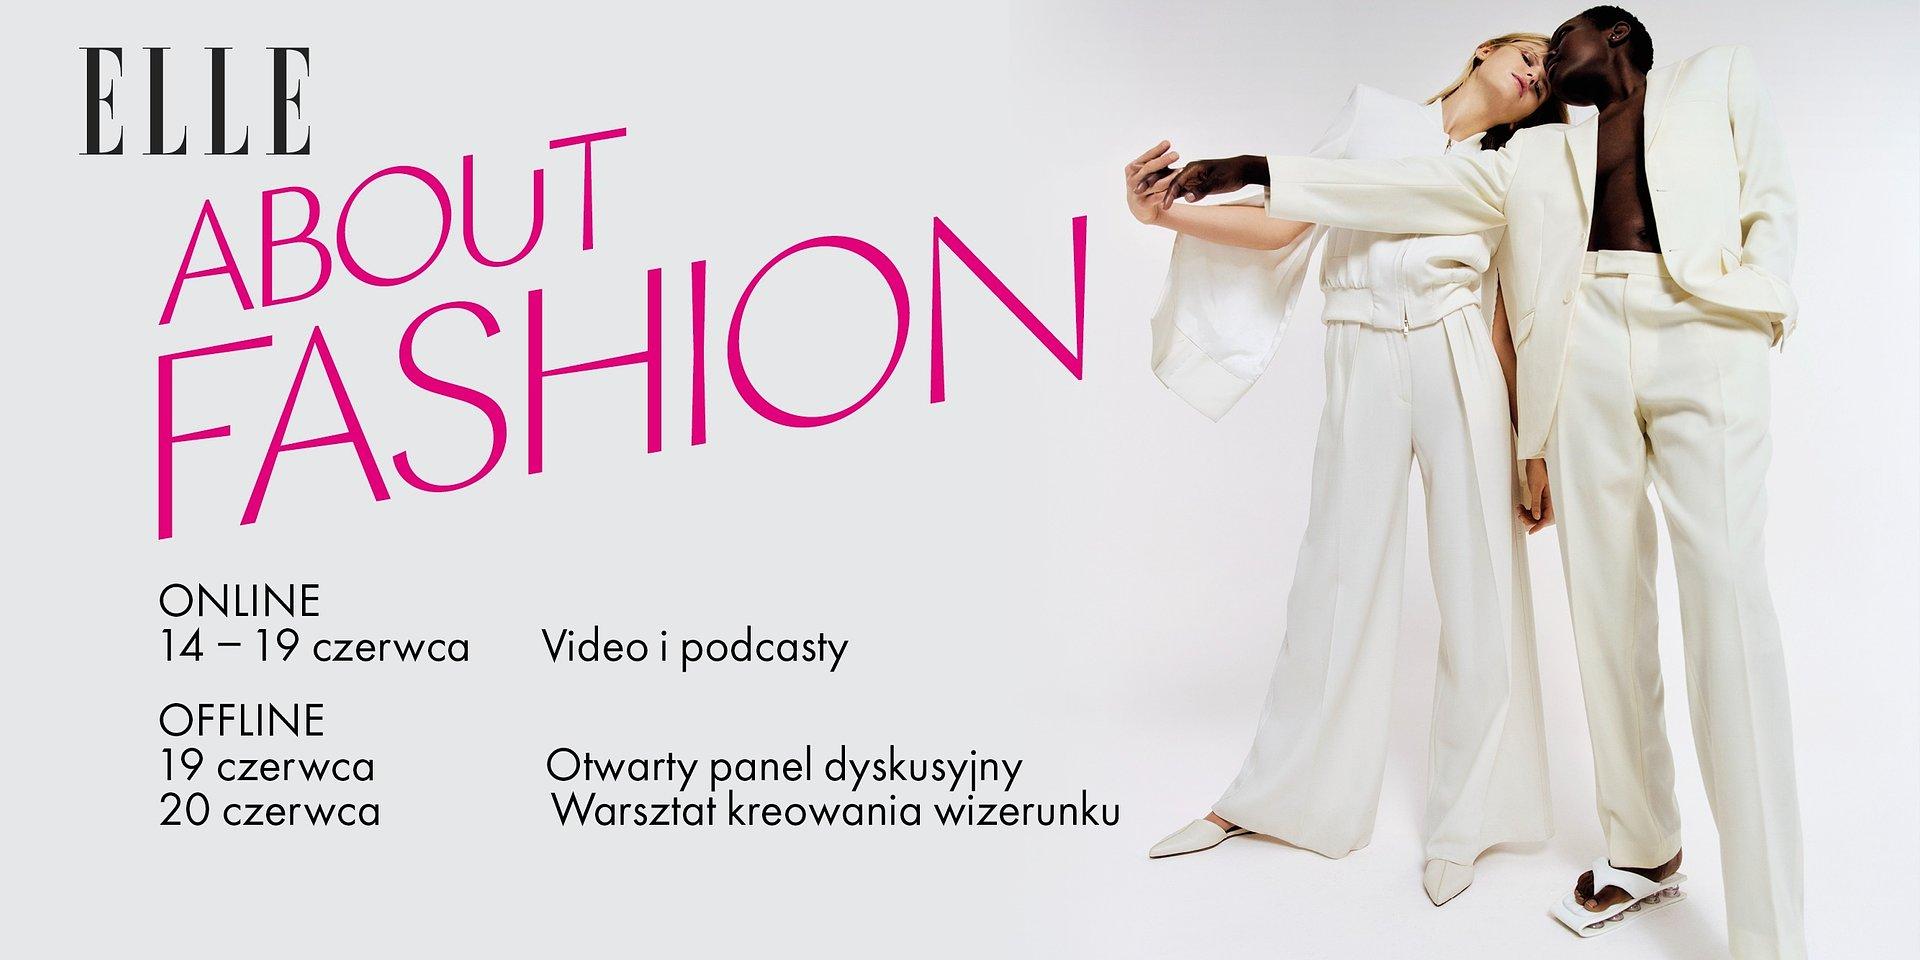 MODIVO partnerem konferencji ELLE About Fashion